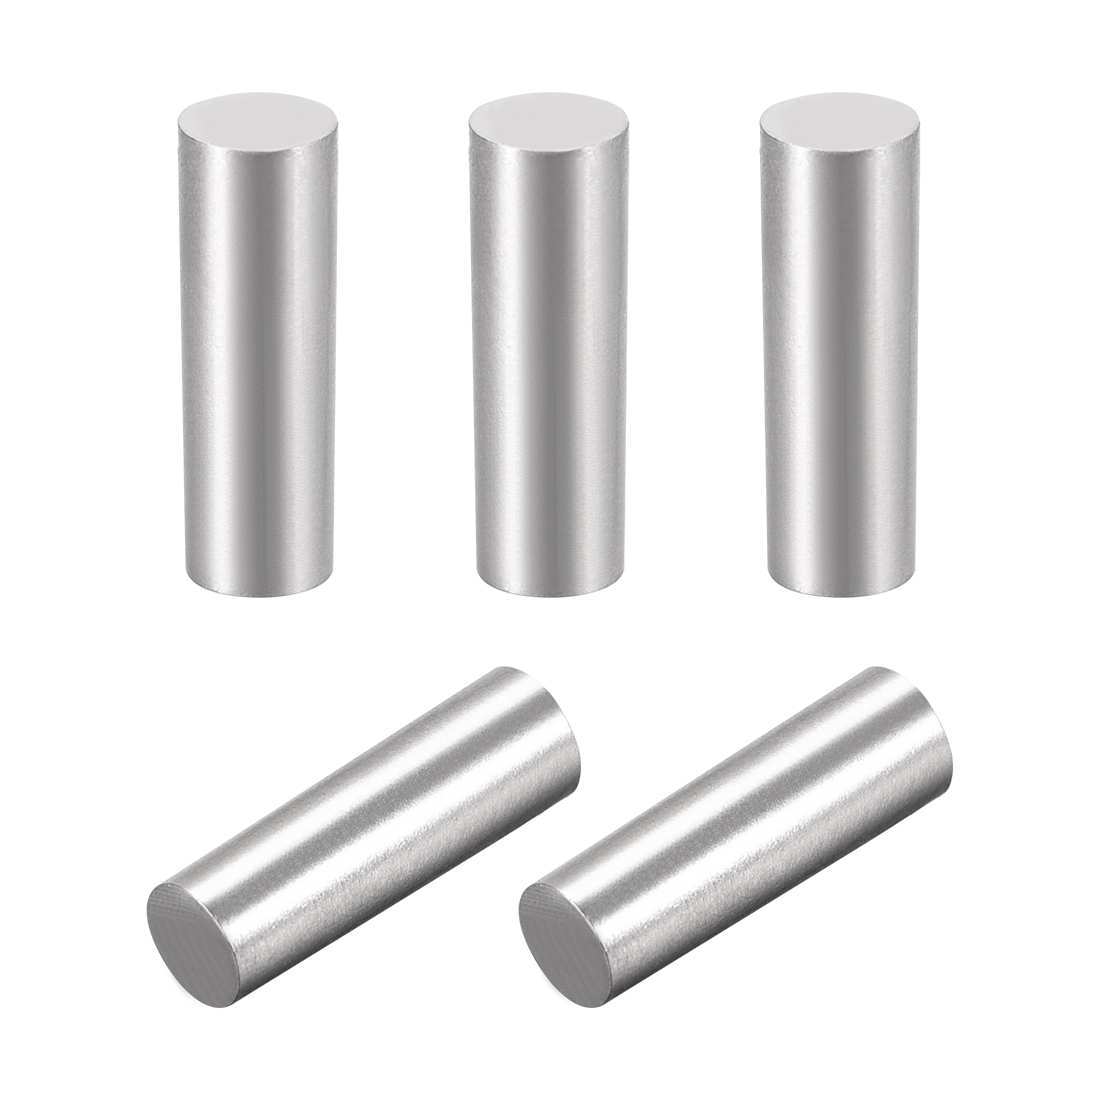 5Pcs 4mm x 16mm 1:50 Taper Pin 304 Stainless Steel Shelf Support Pin Fasten